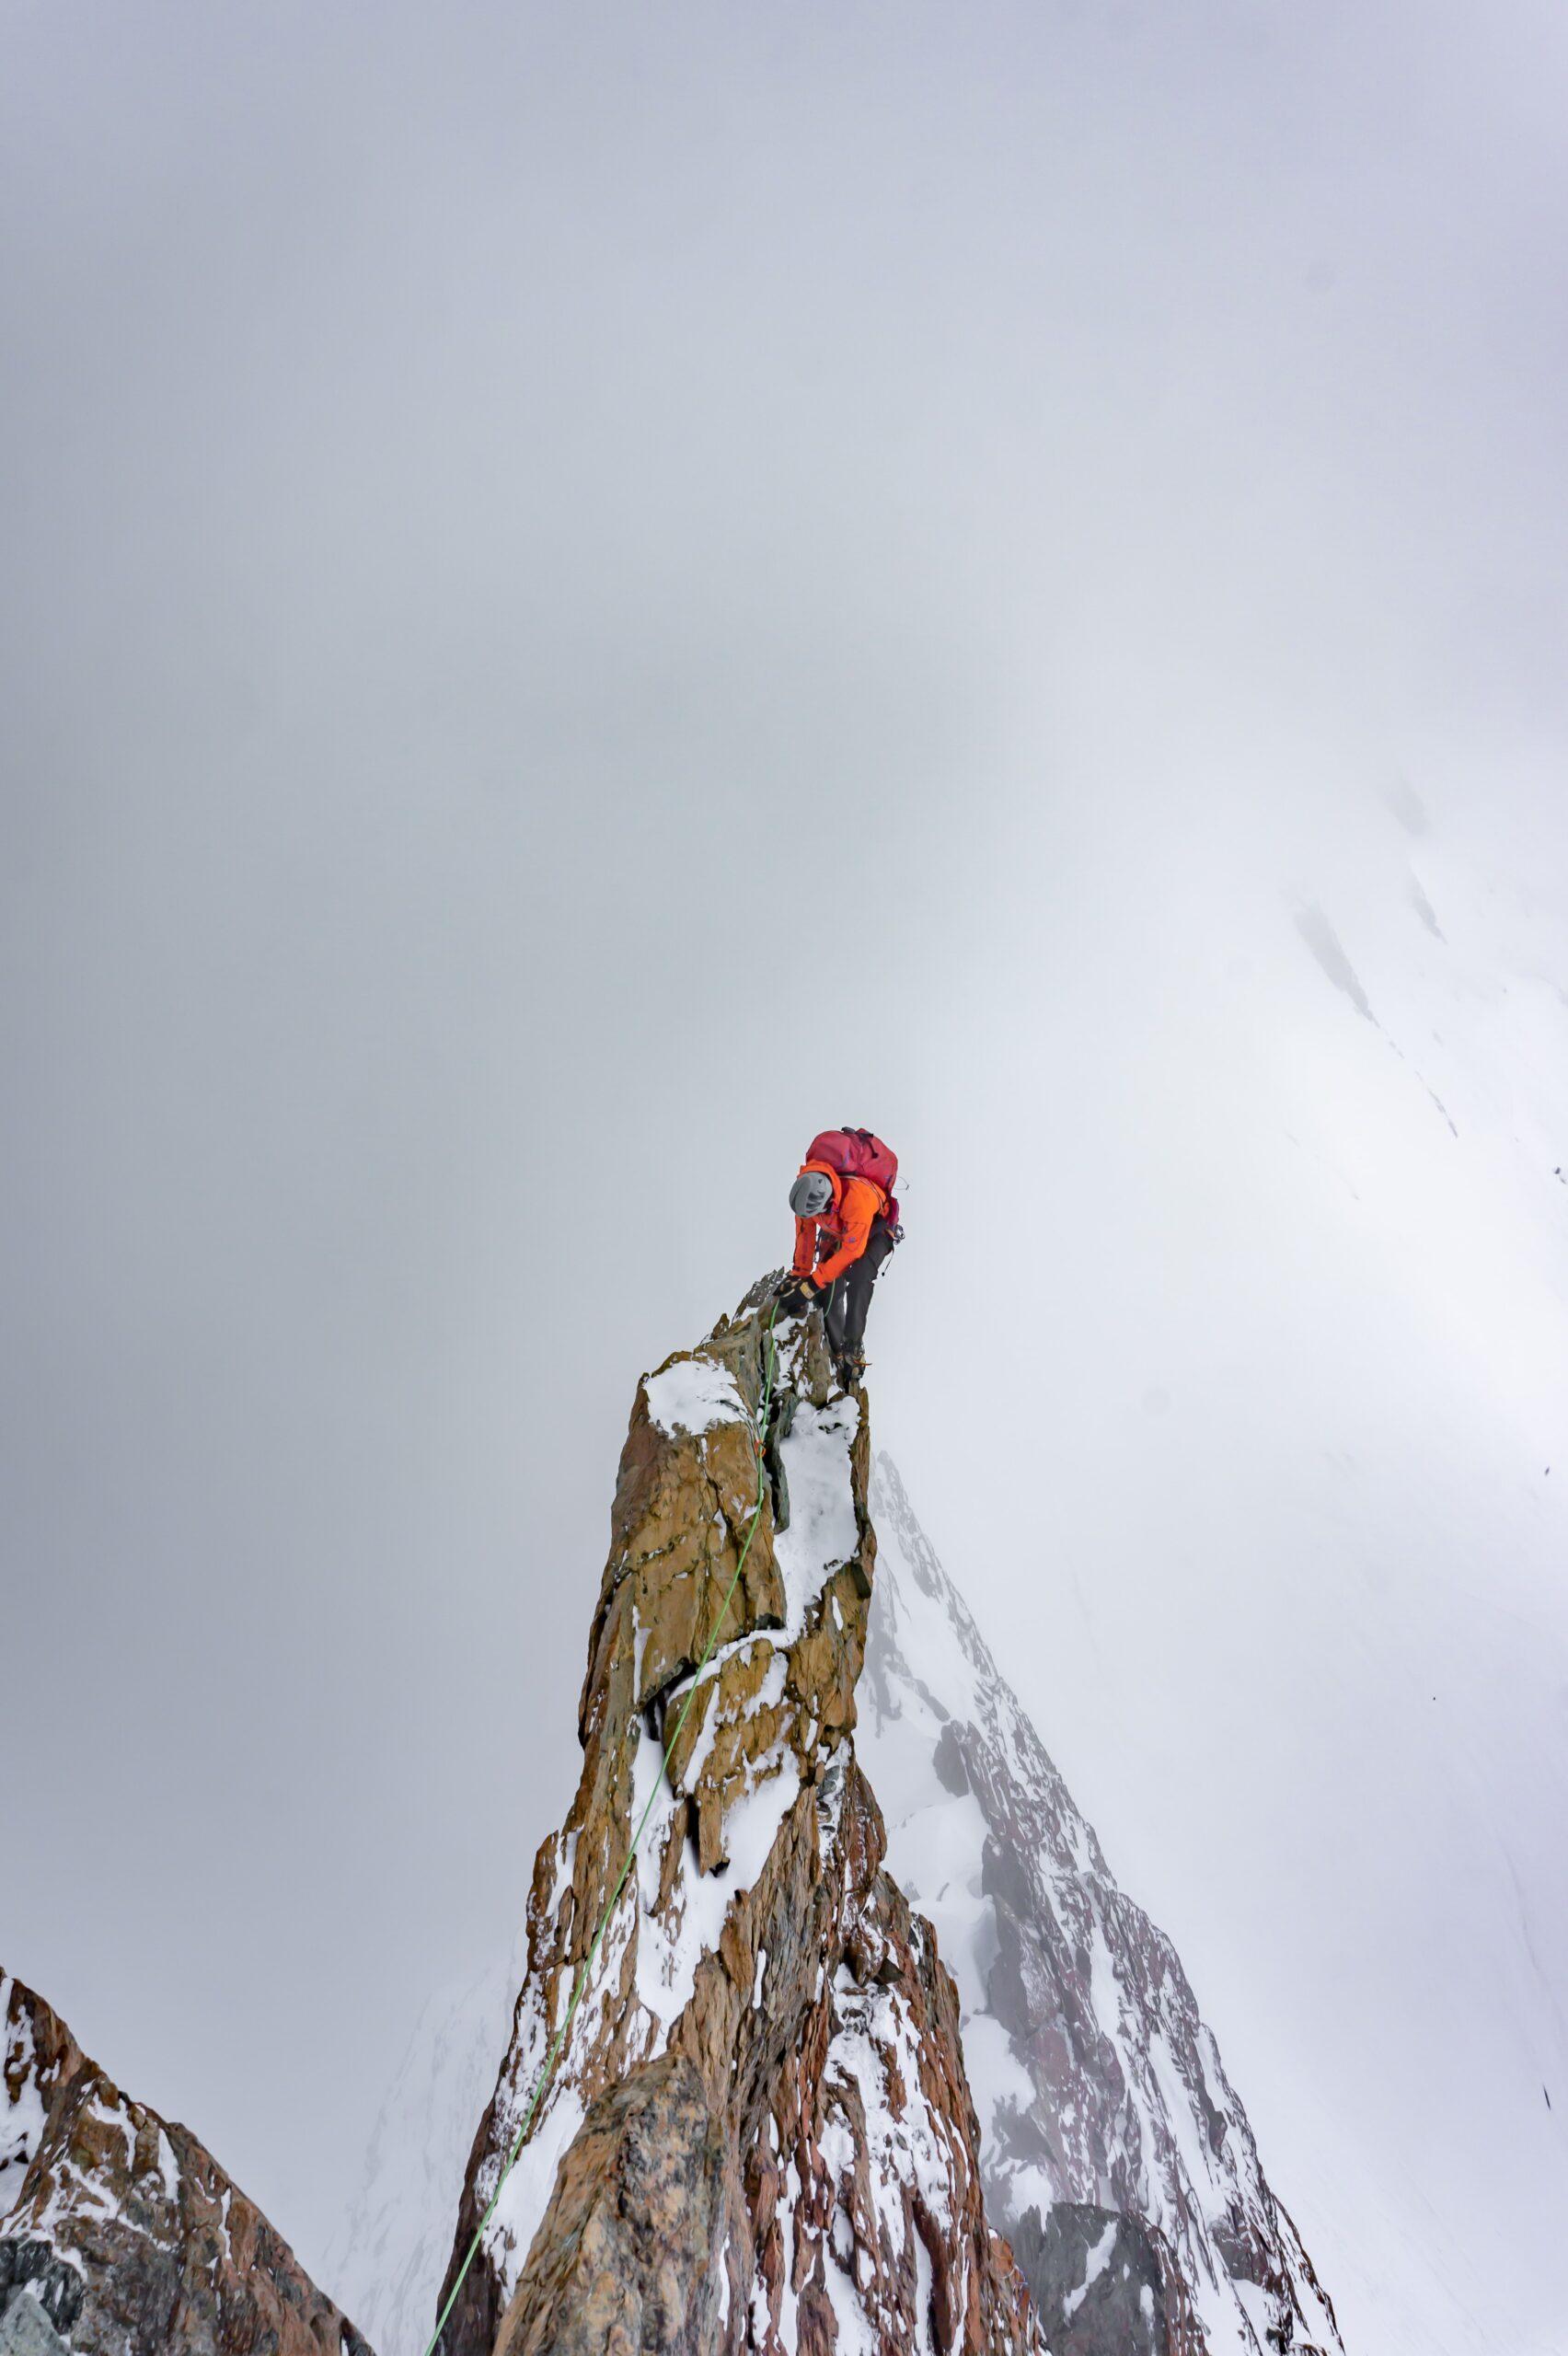 Climbing Workout: a climber reaching the peak of a mountain.